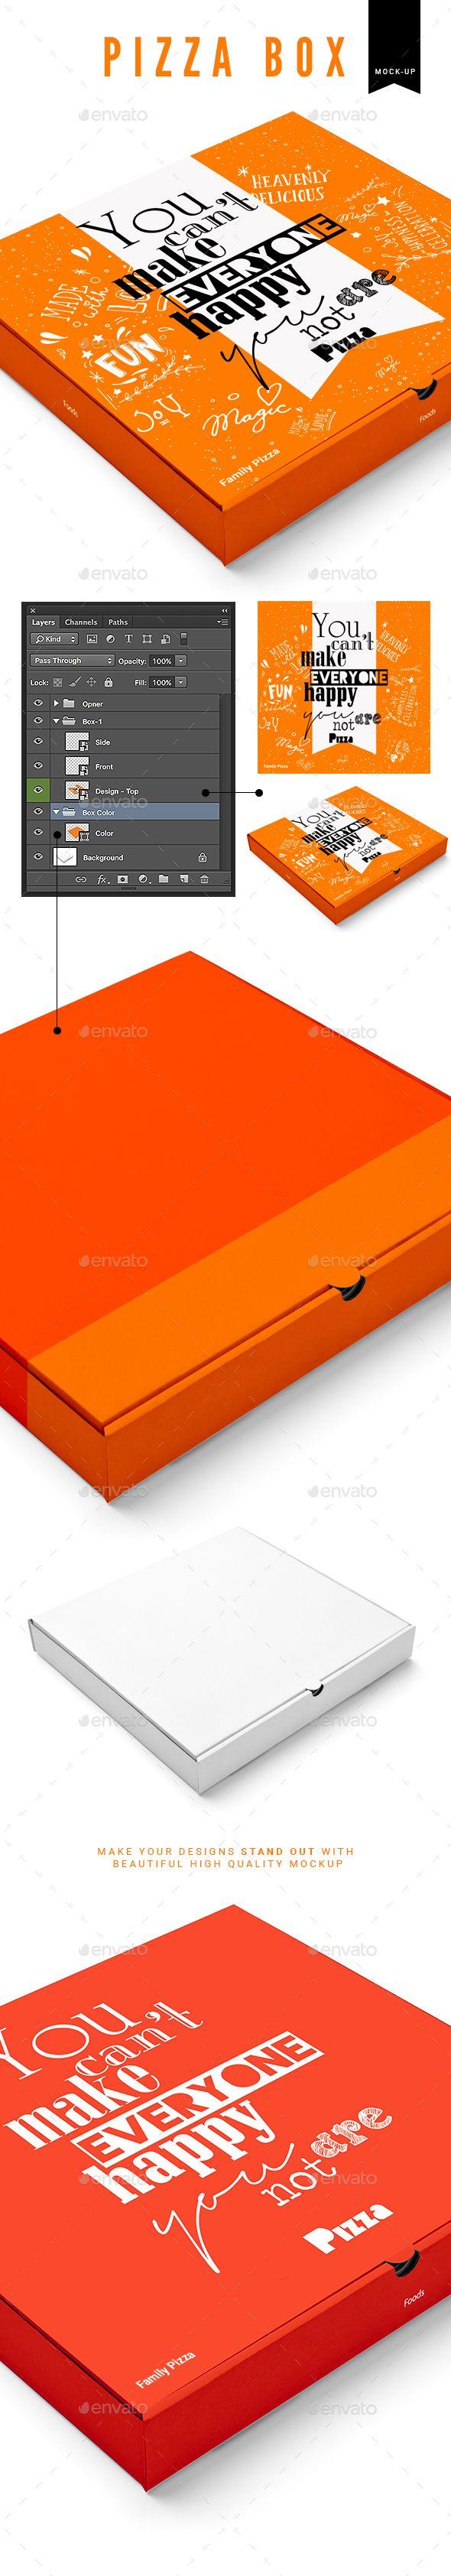 Pizza Box Mock-Up. Download here: http://graphicriver.net/item/pizza-box-mockup/16922202?ref=ksioks